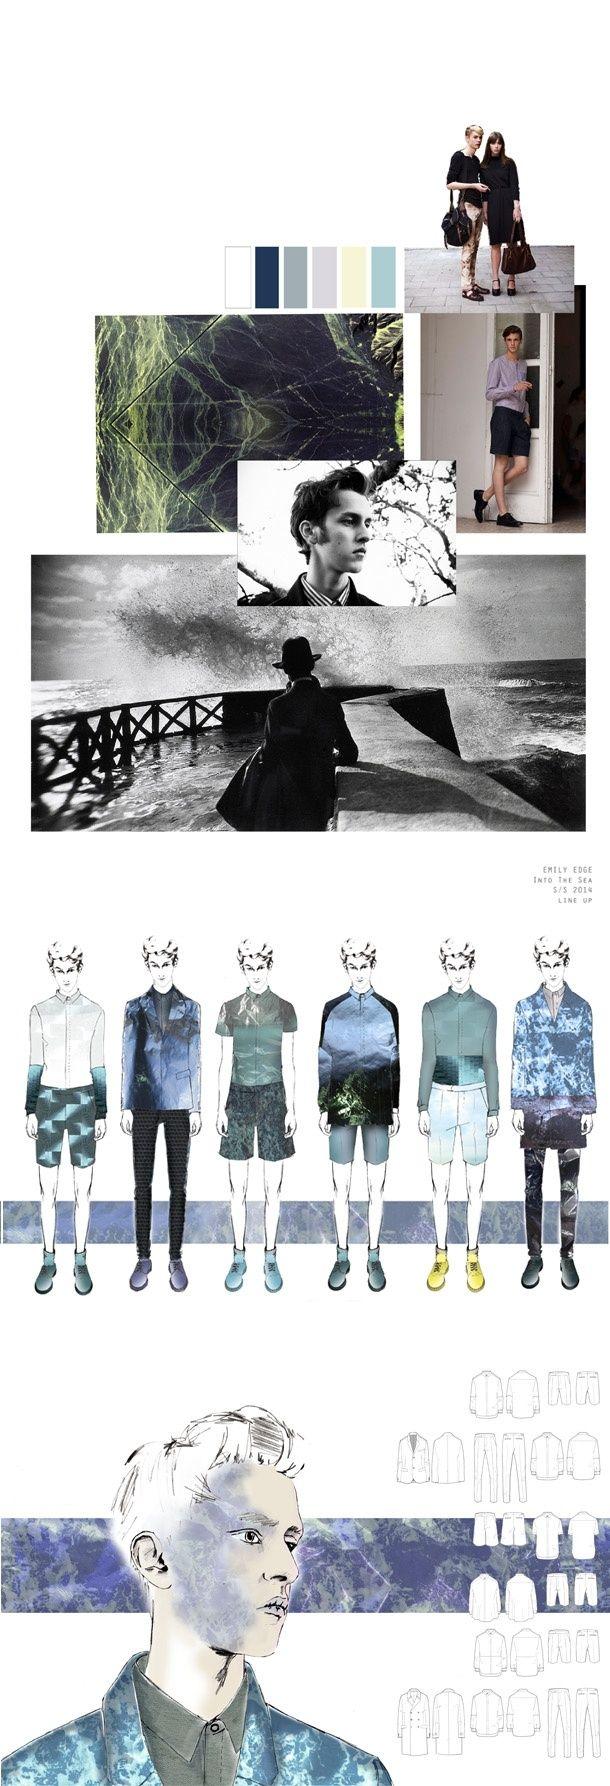 Fashion Portfolio layout - fashion design development with sea-inspired prints - fashion mood board; fashion sketchbook; lineup; fashion illustration // Emily Edge